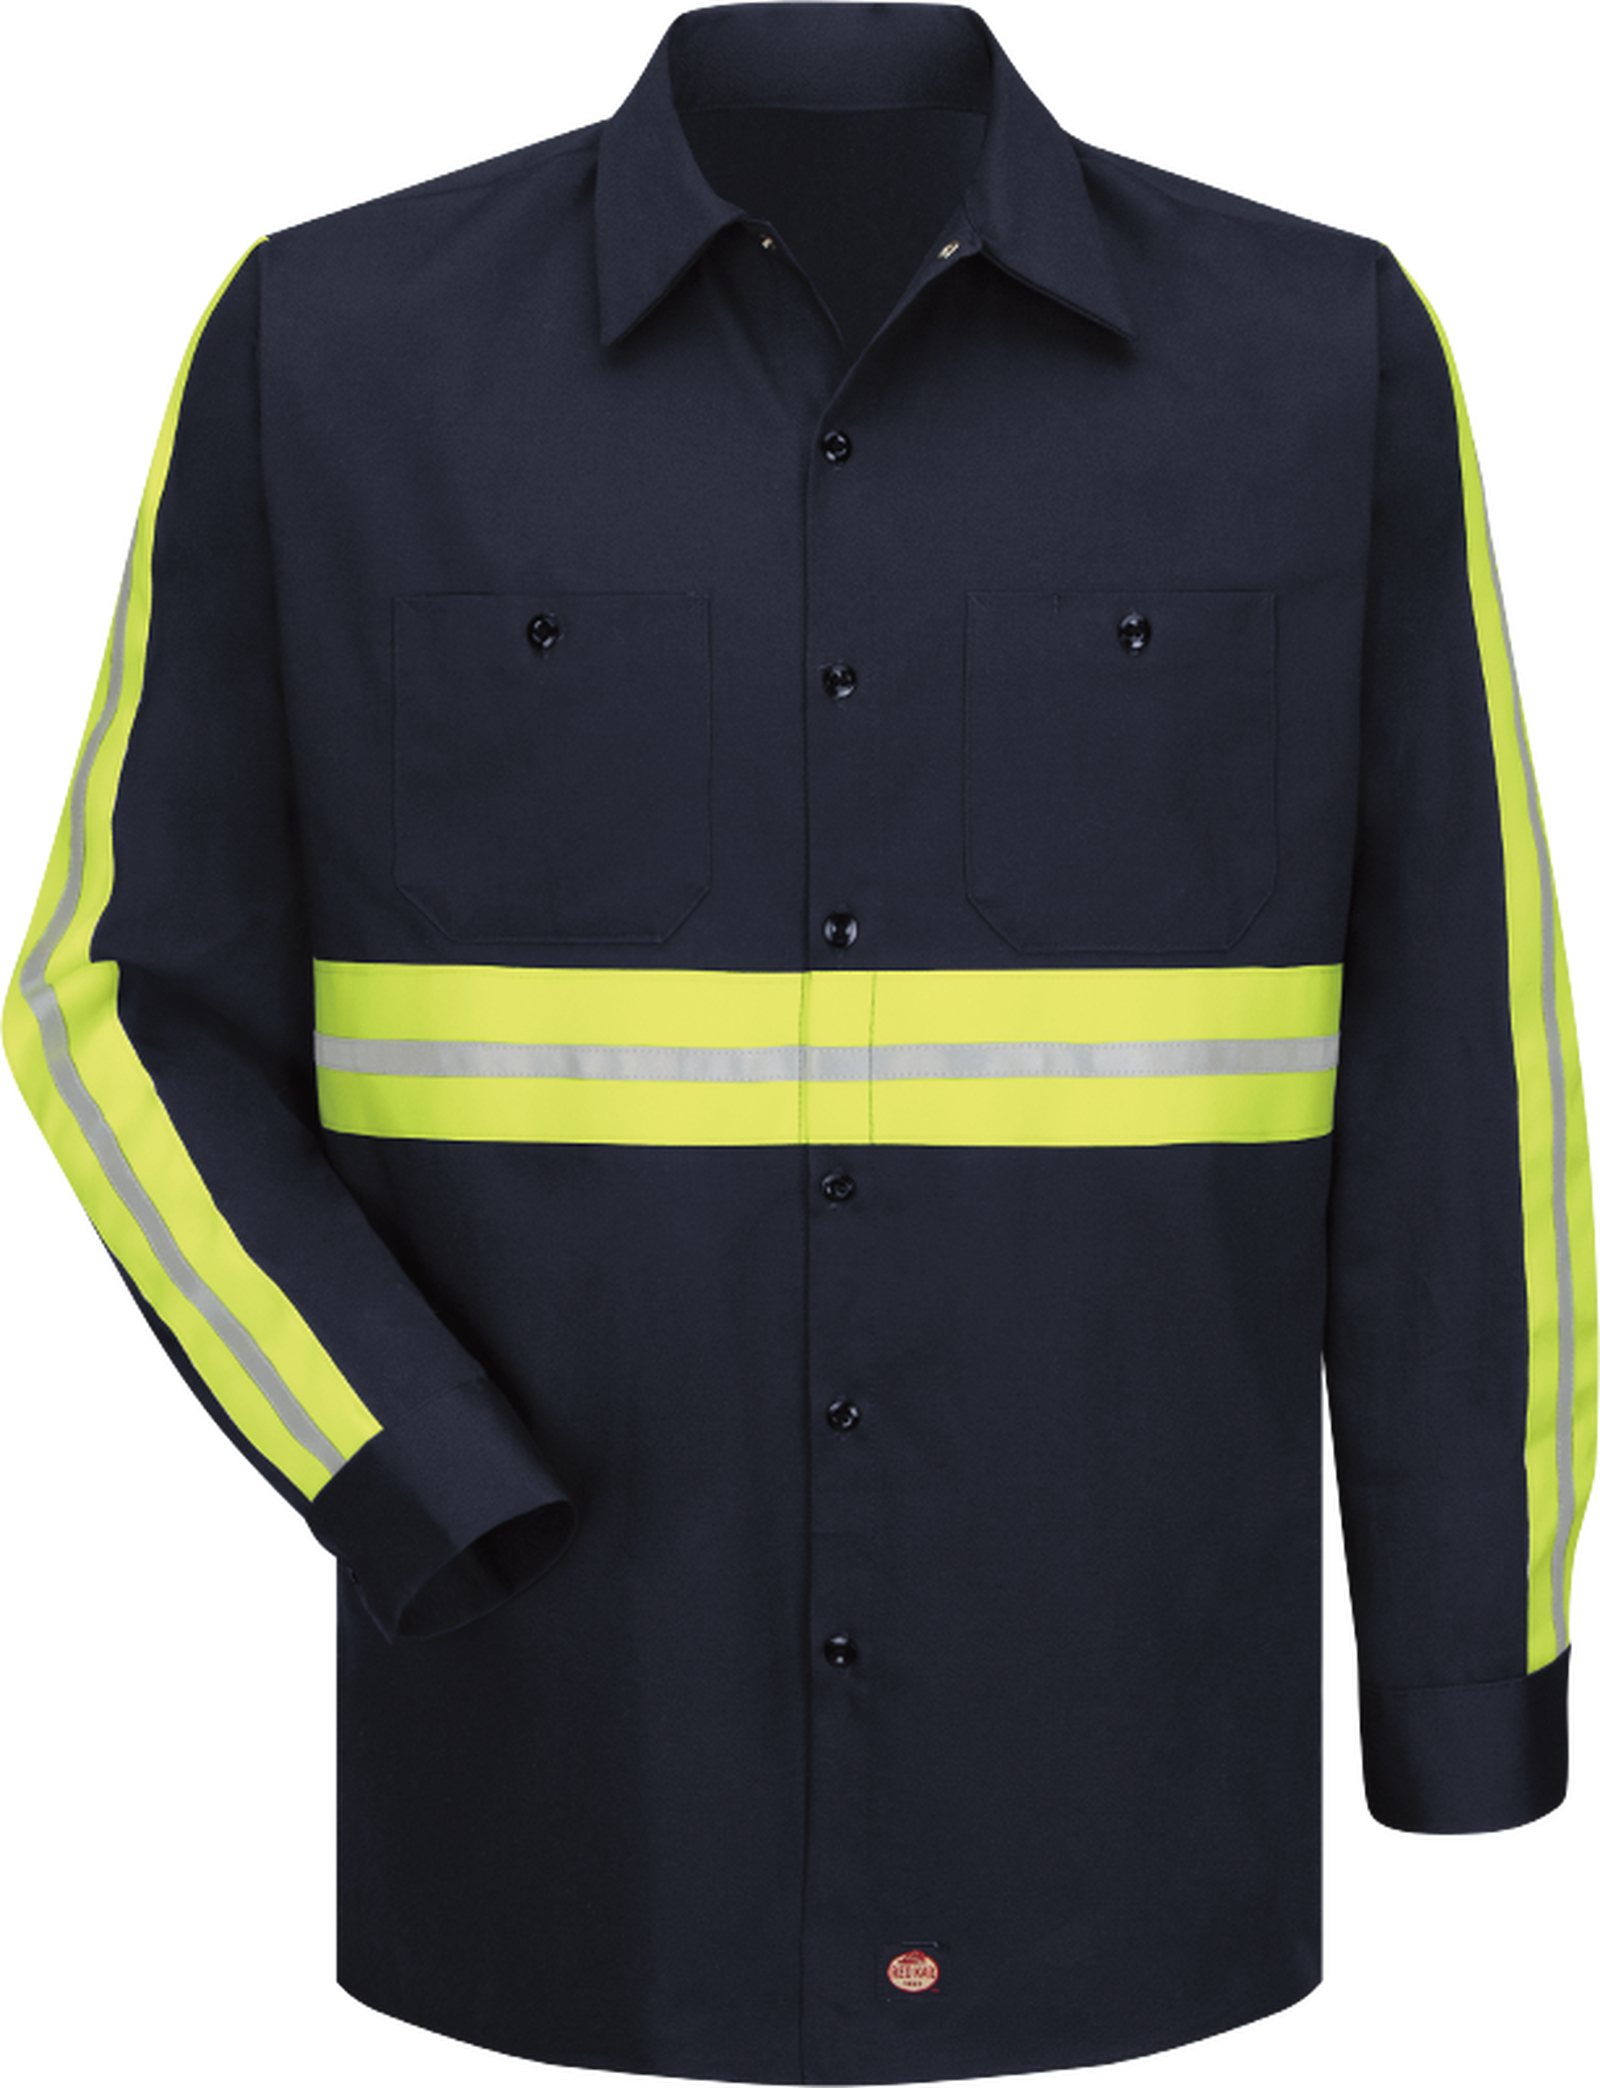 Long Sleeve Enhanced Visibility Cotton Work Shirt